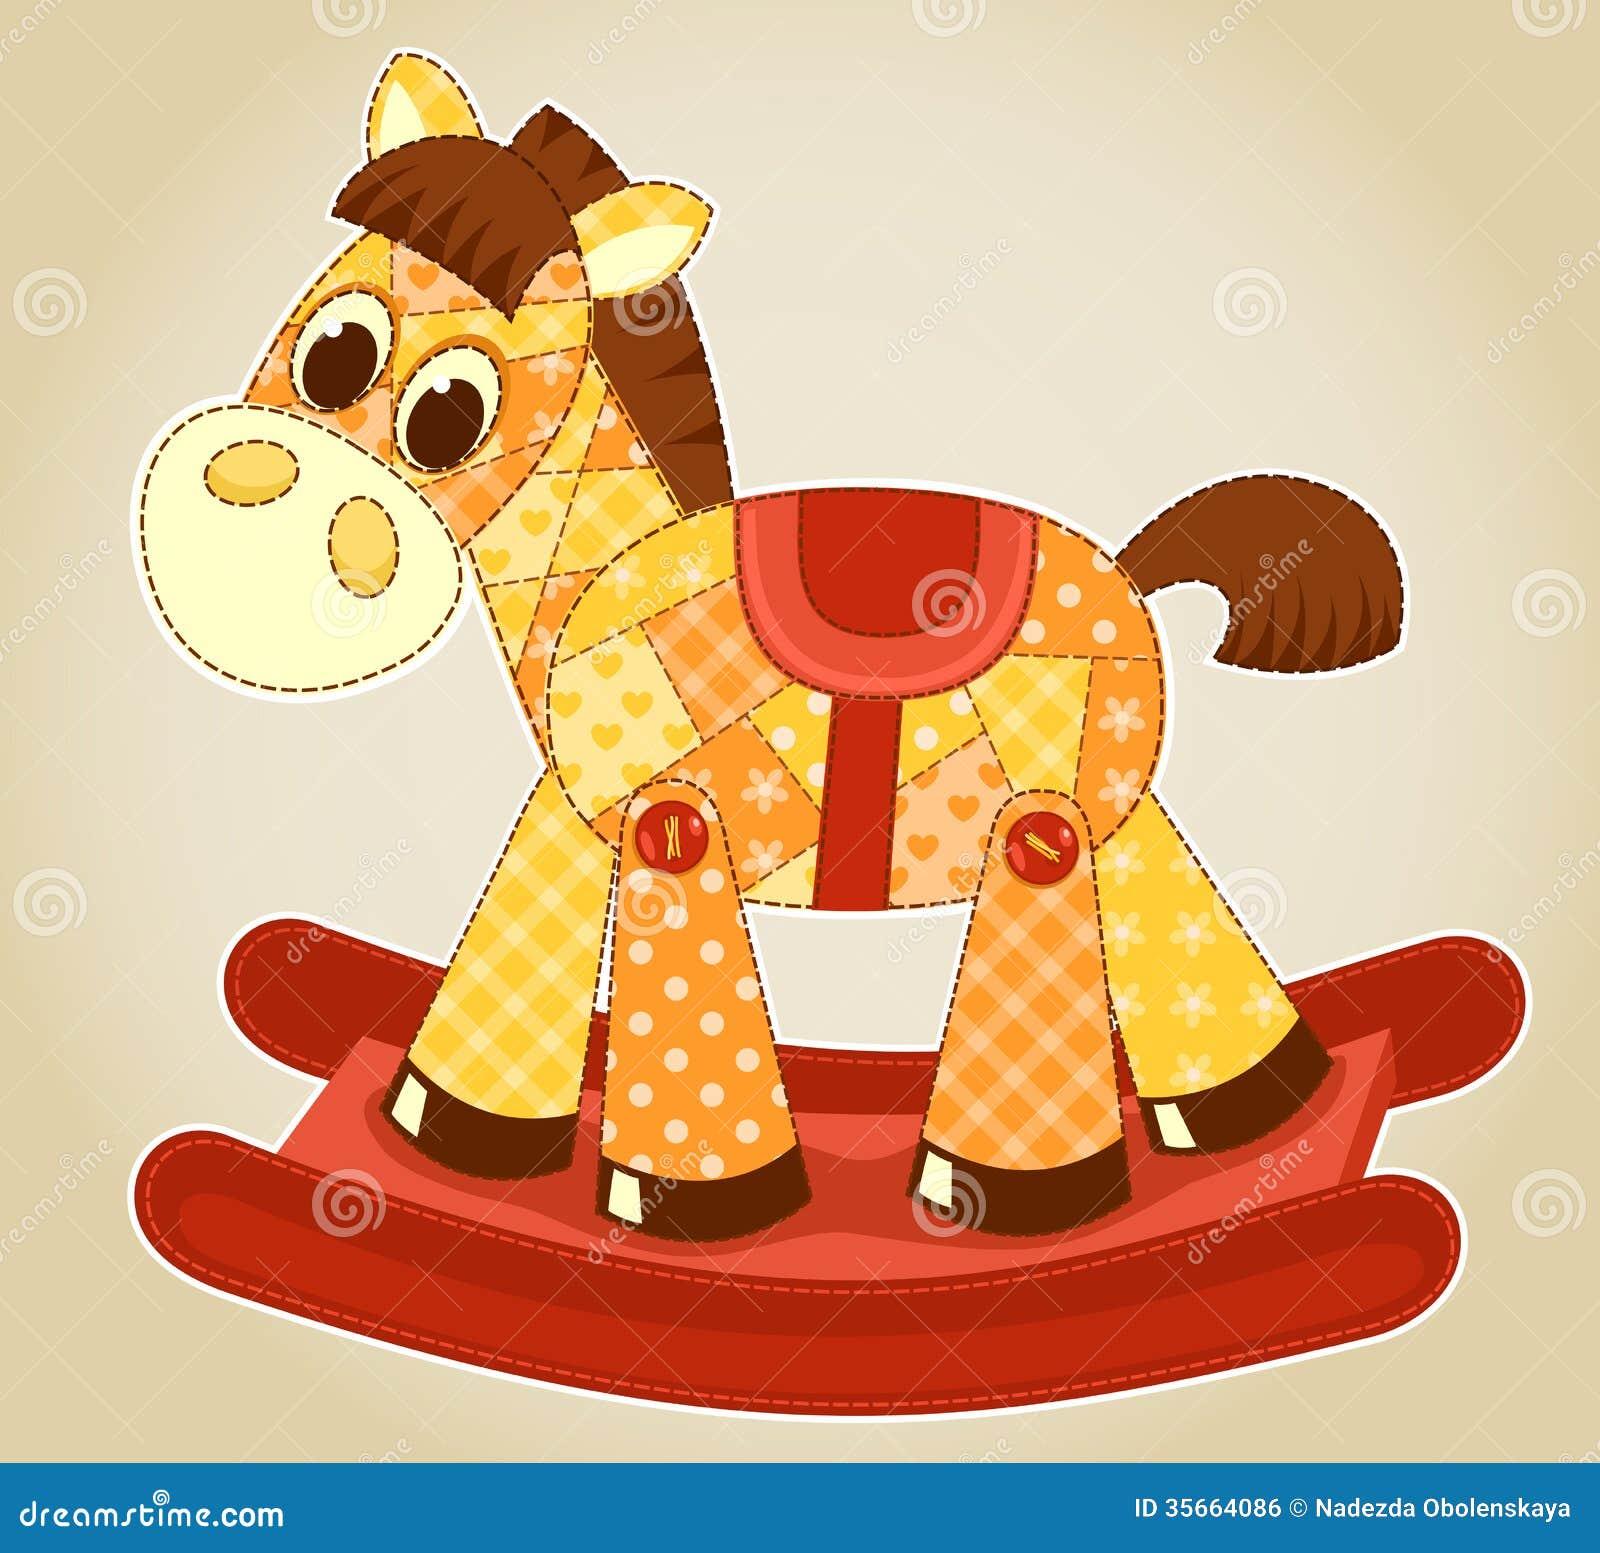 Application Rocking Horse Royalty Free Stock Image - Image: 35664086